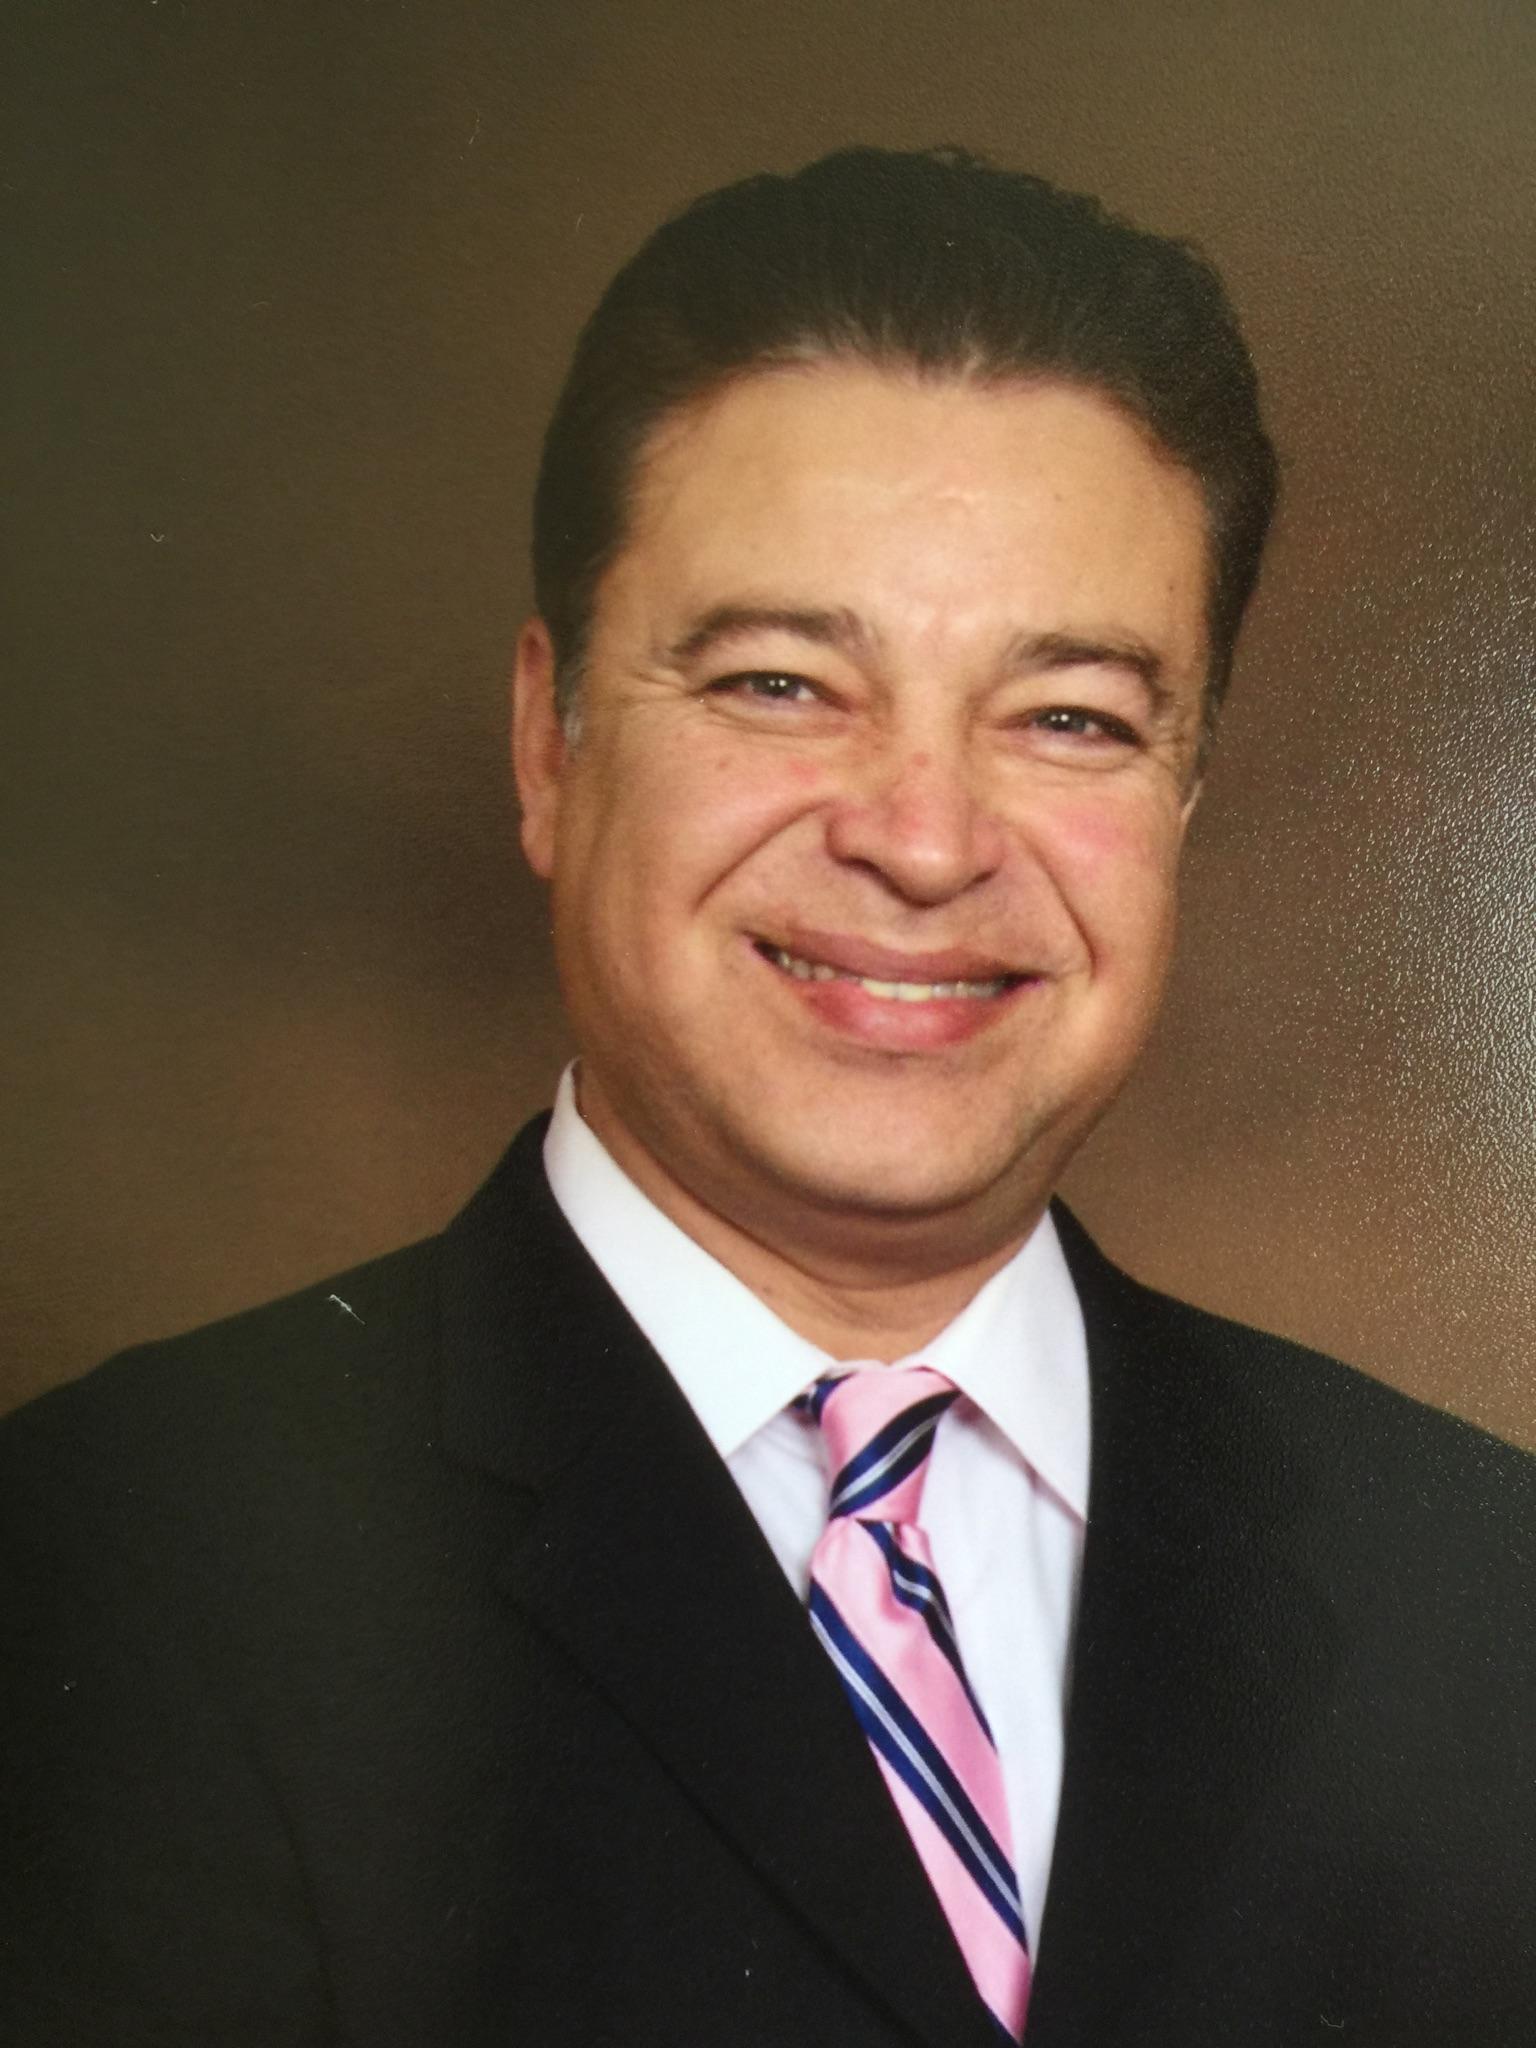 Profile Photo of Dr. Jafari